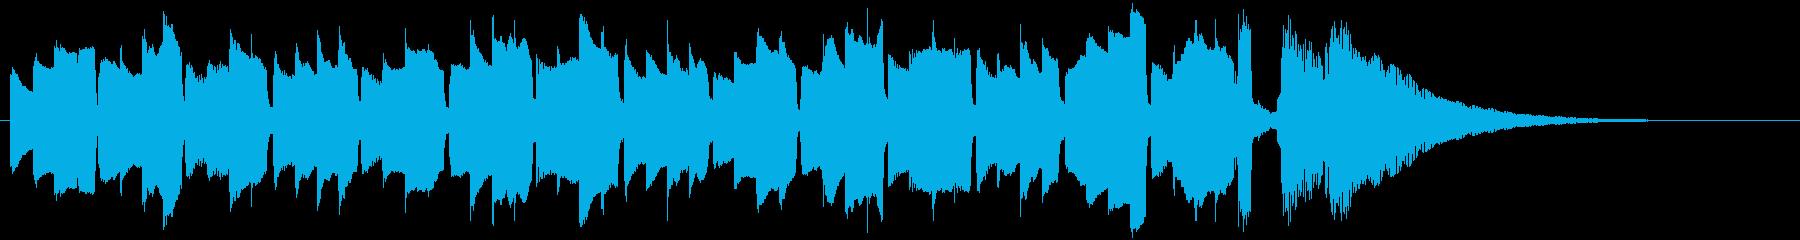 Akogi's gentle simple arpeggio's reproduced waveform